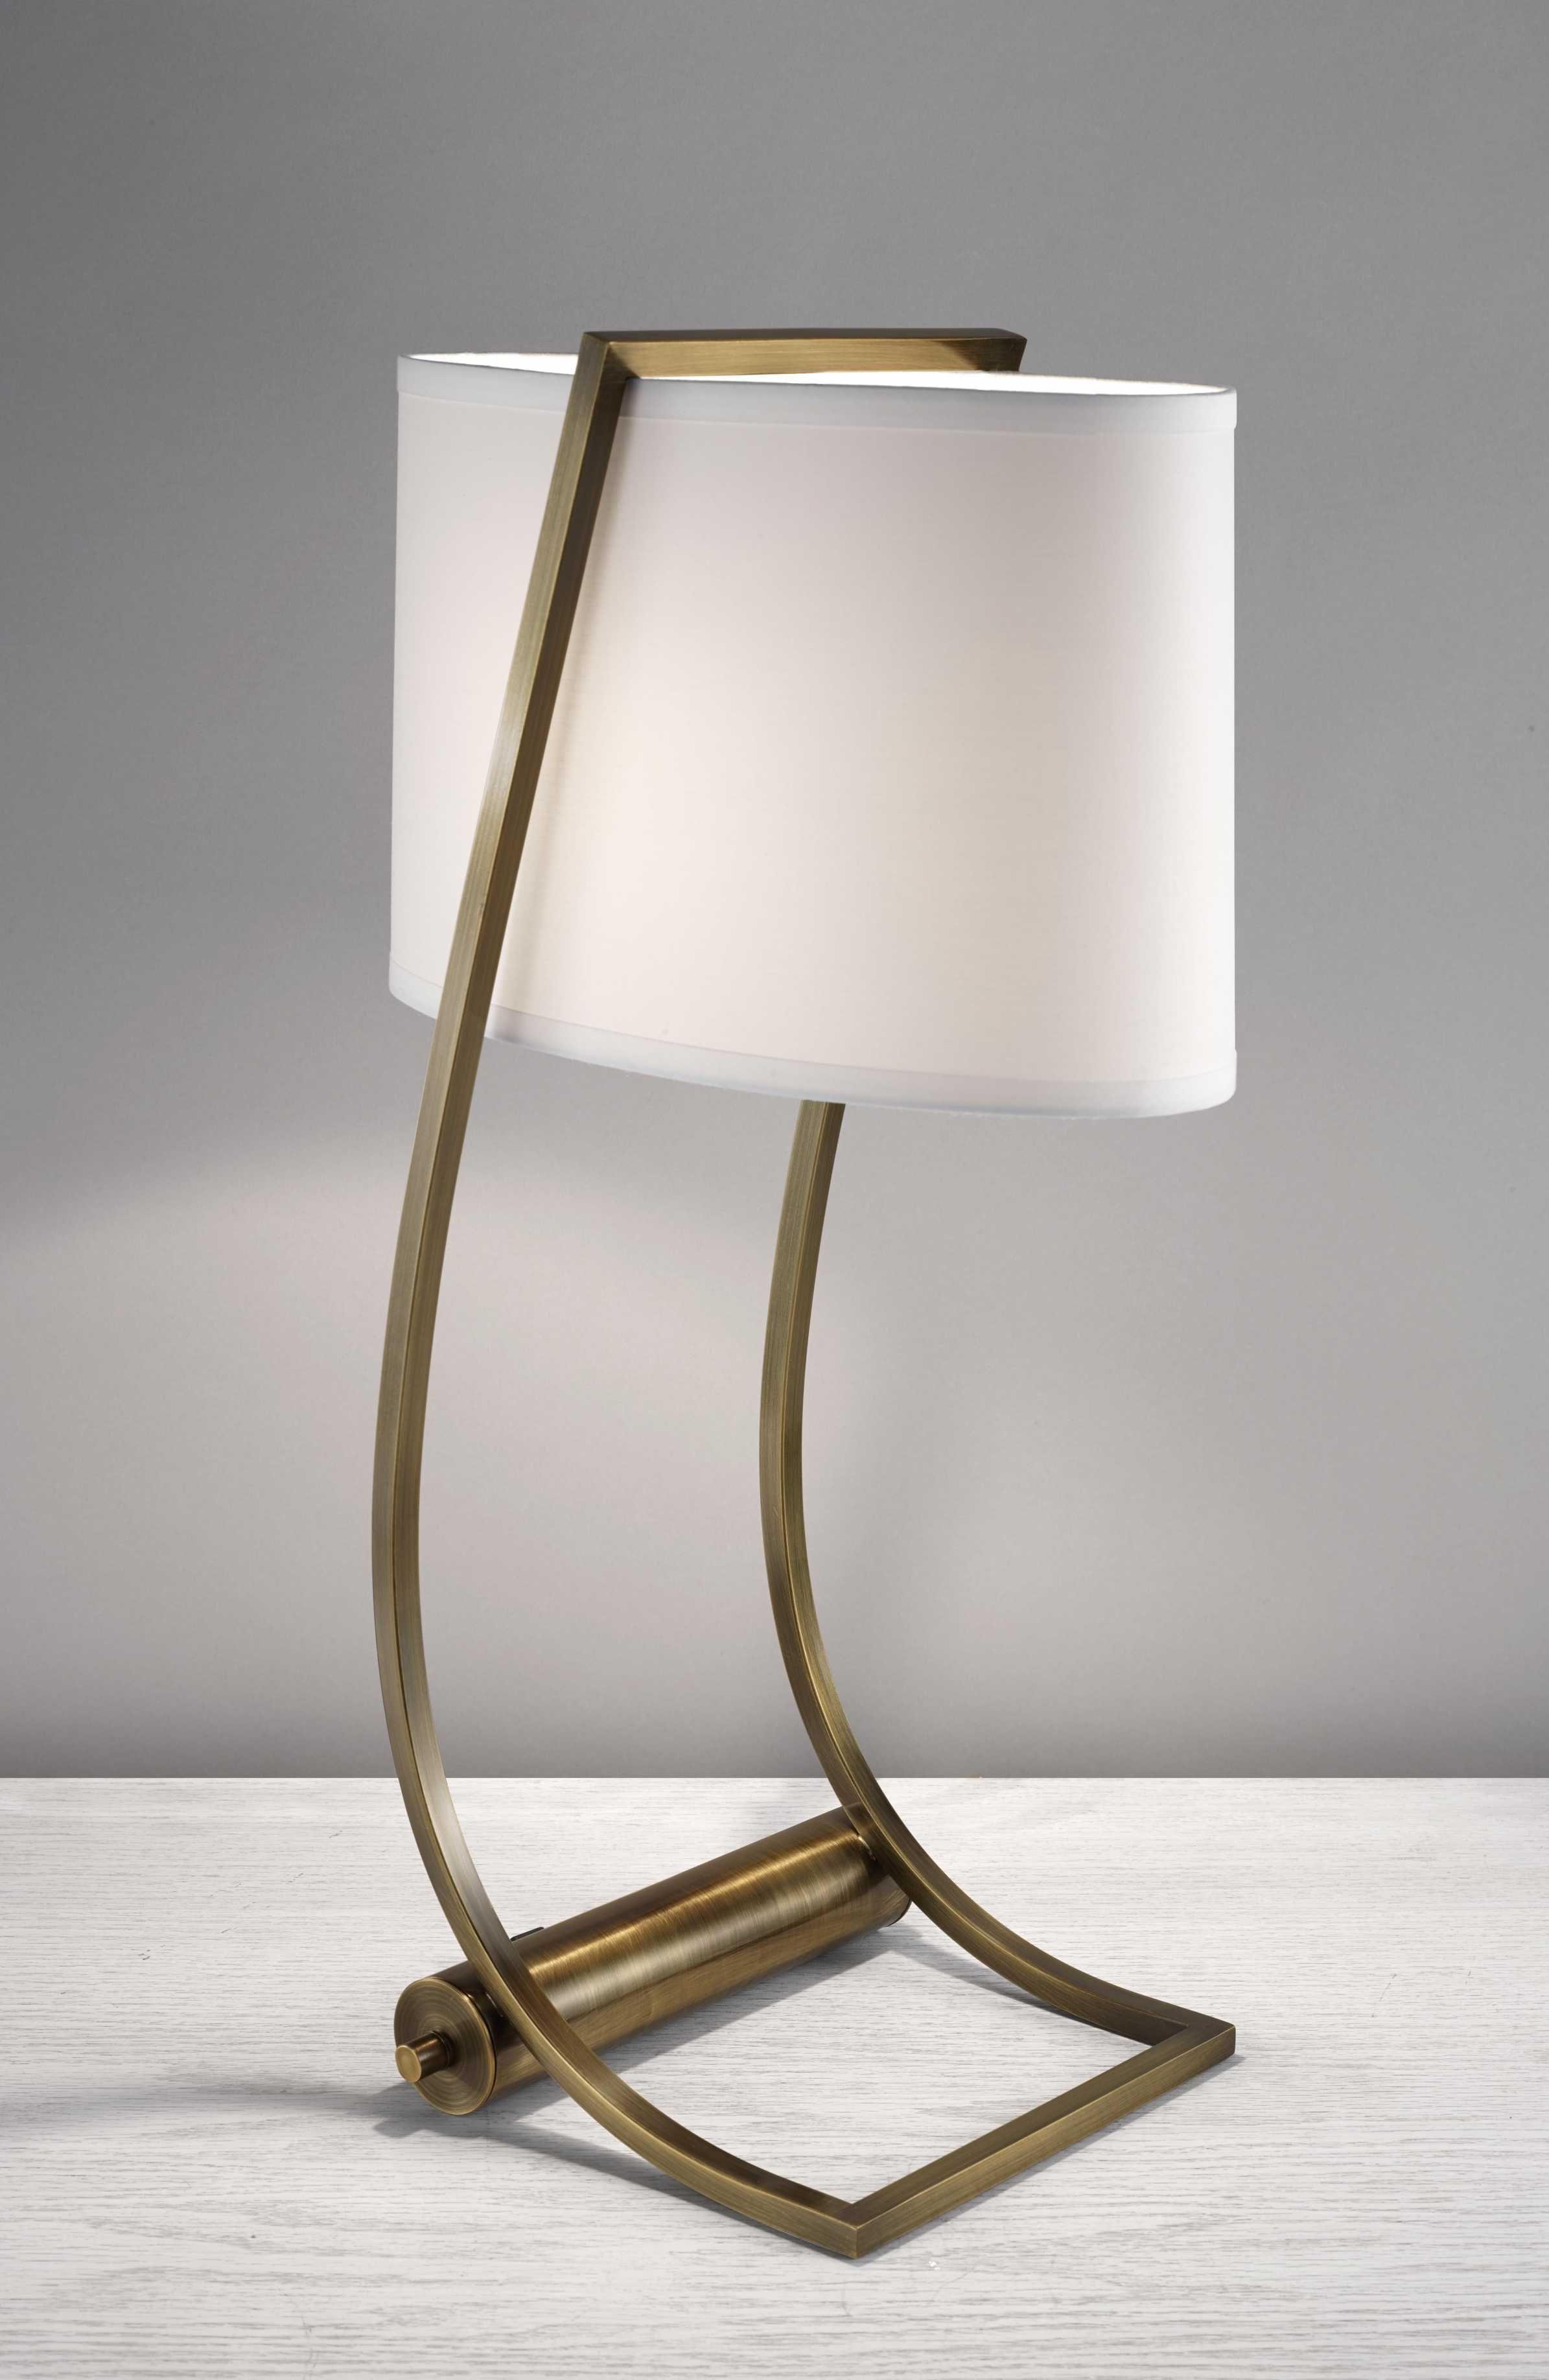 Desk Lamp With Usb Port Price Desk Lamp With Usb Port Price Desk